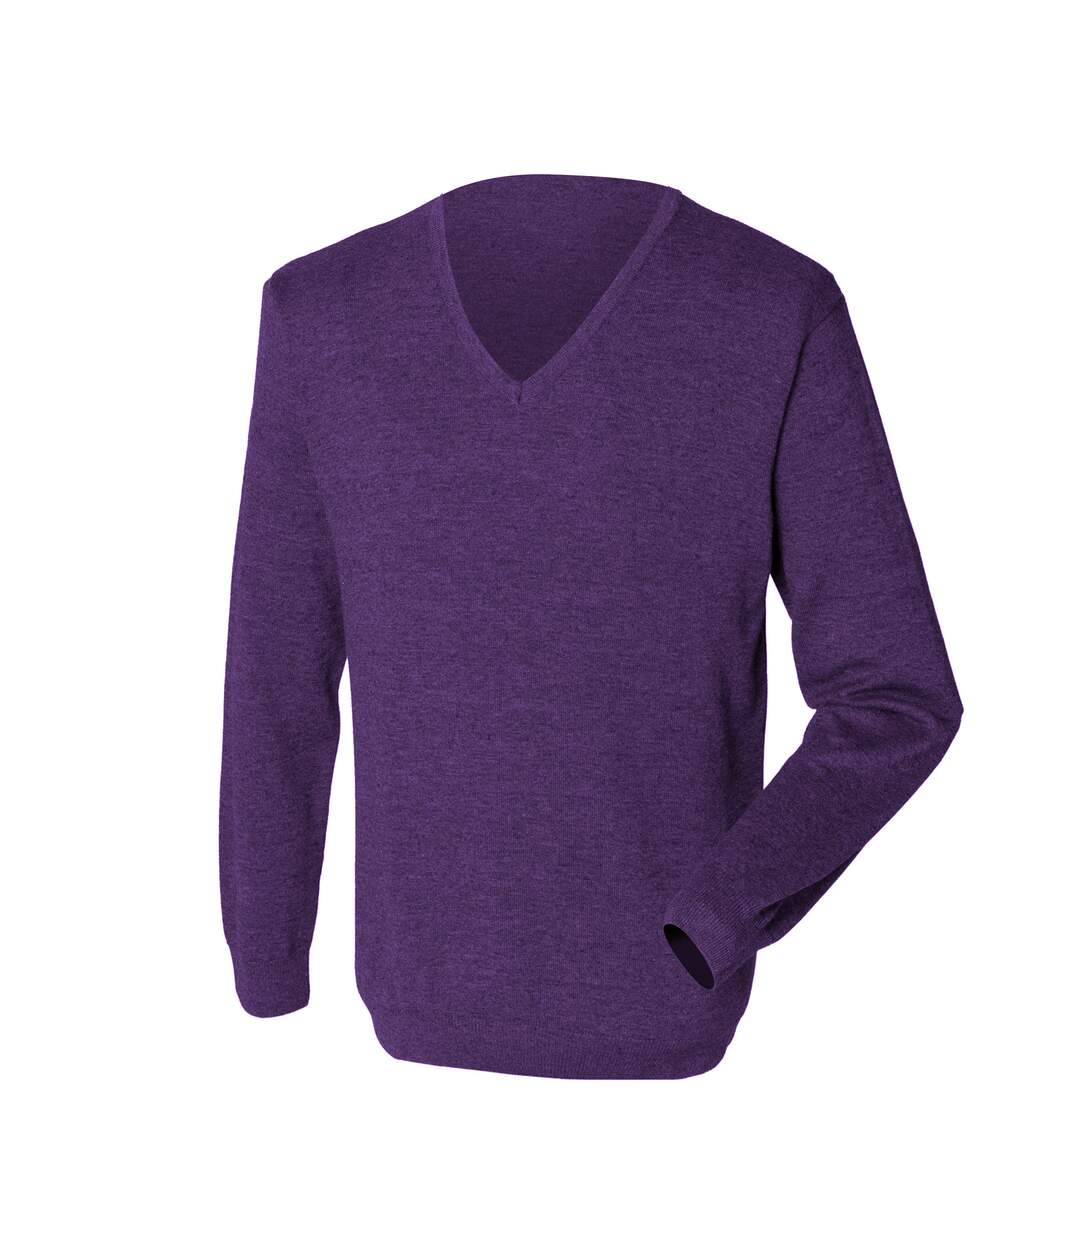 Henbury Mens 12 Gauge Fine Knit V-Neck Jumper / Sweatshirt (Purple) - UTRW659